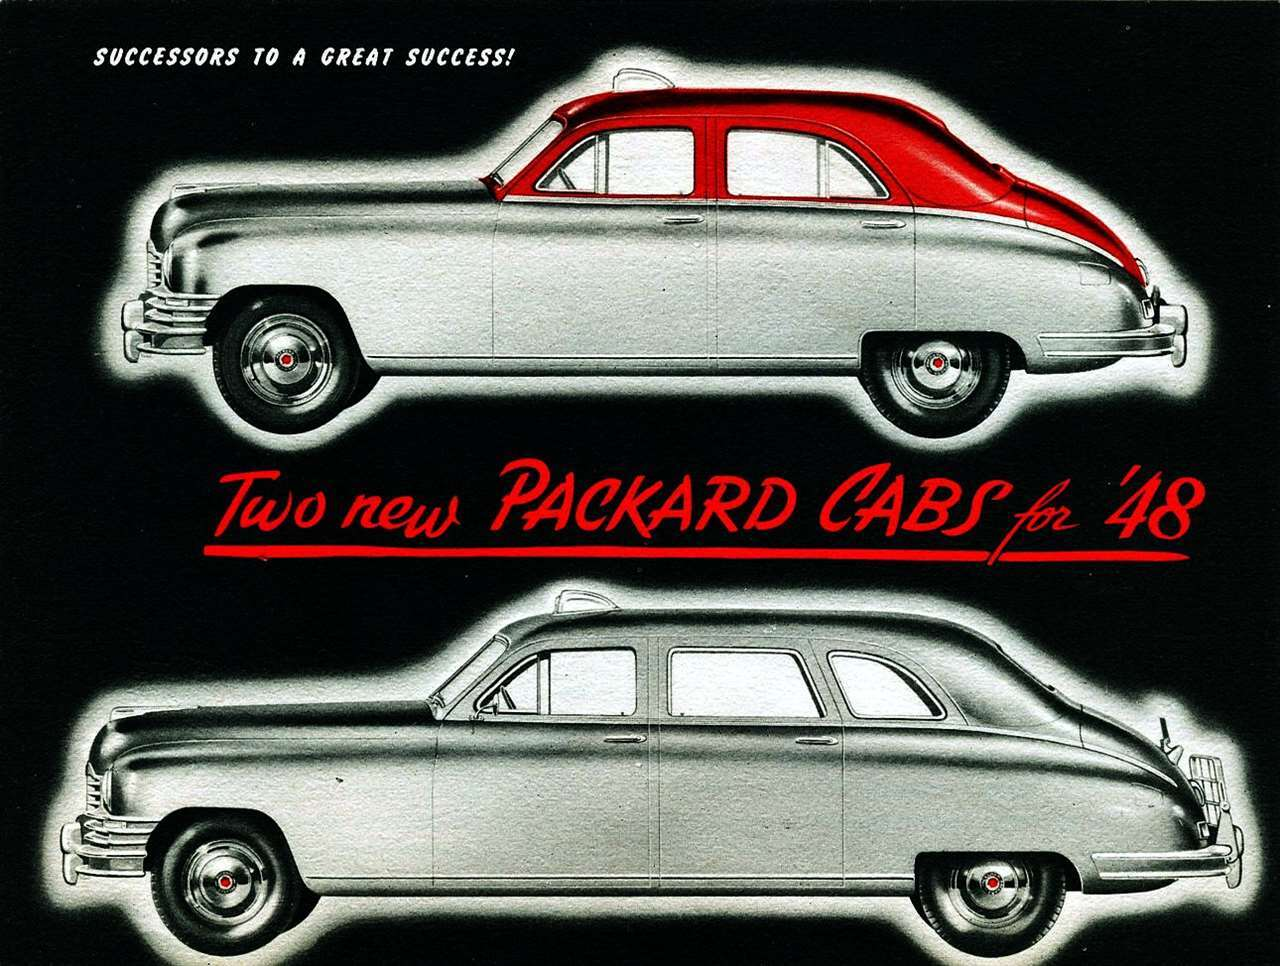 1948 Packard Cabs